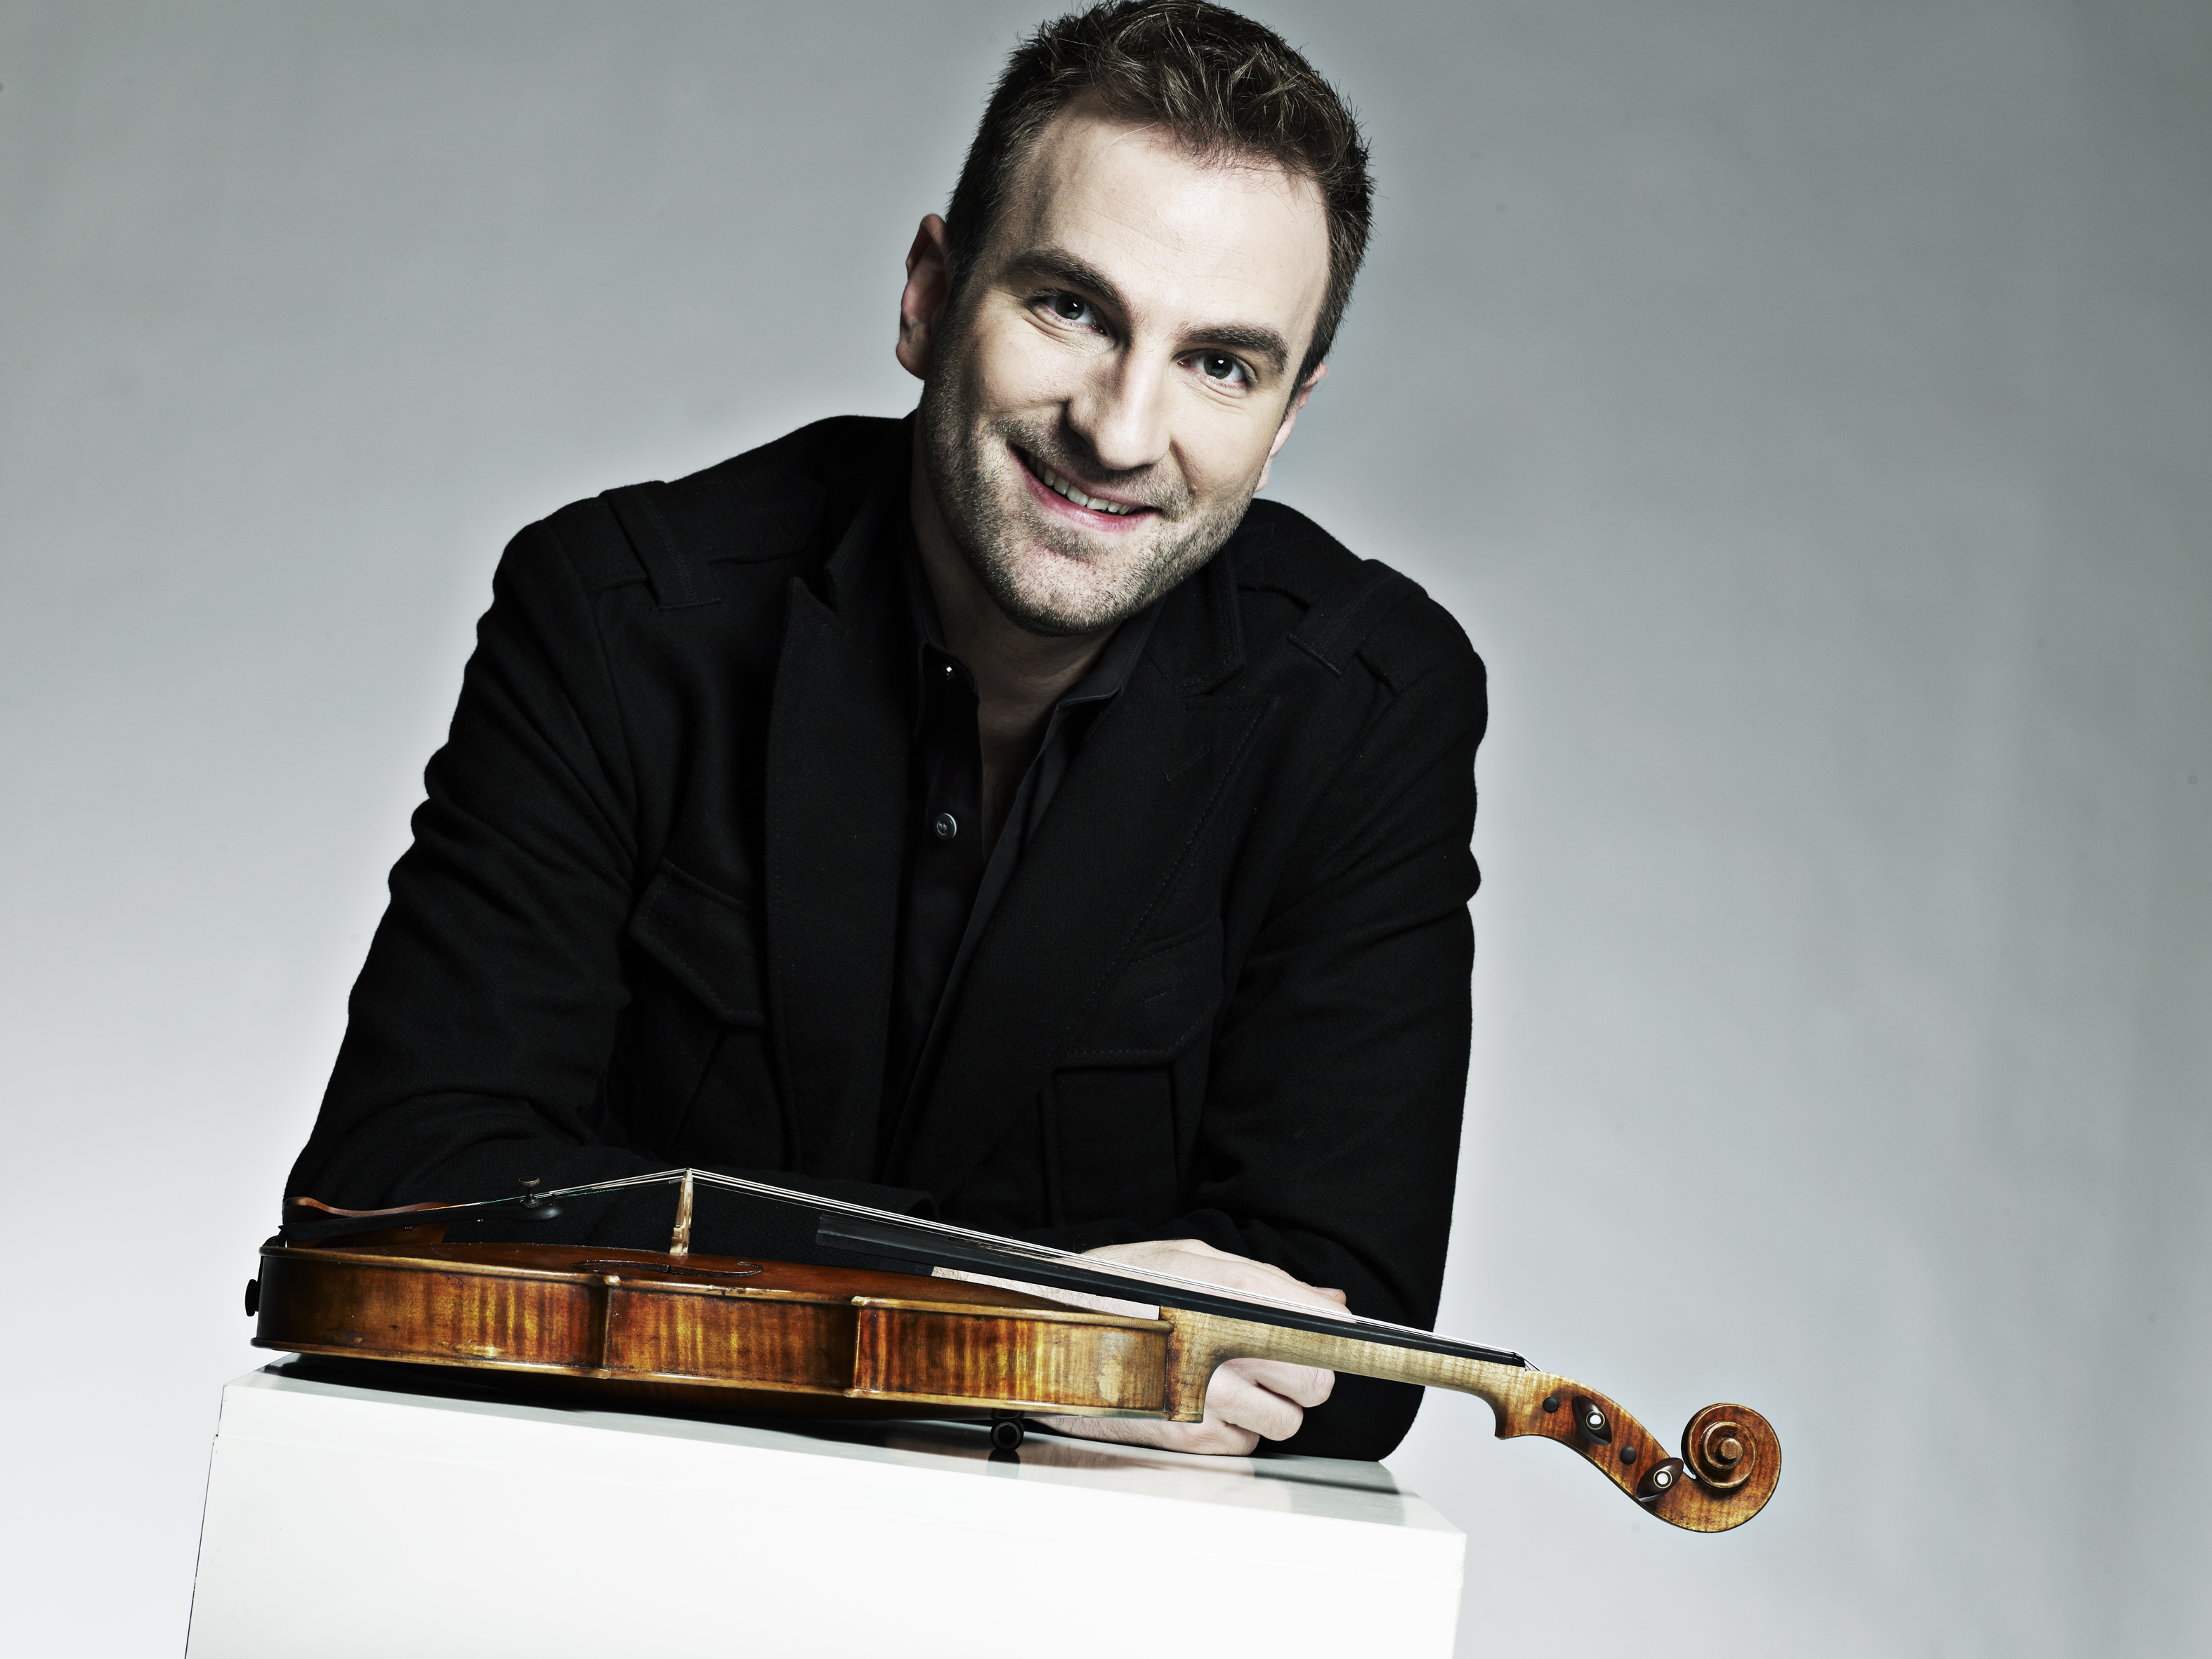 il violinista Stefan Milenkovich